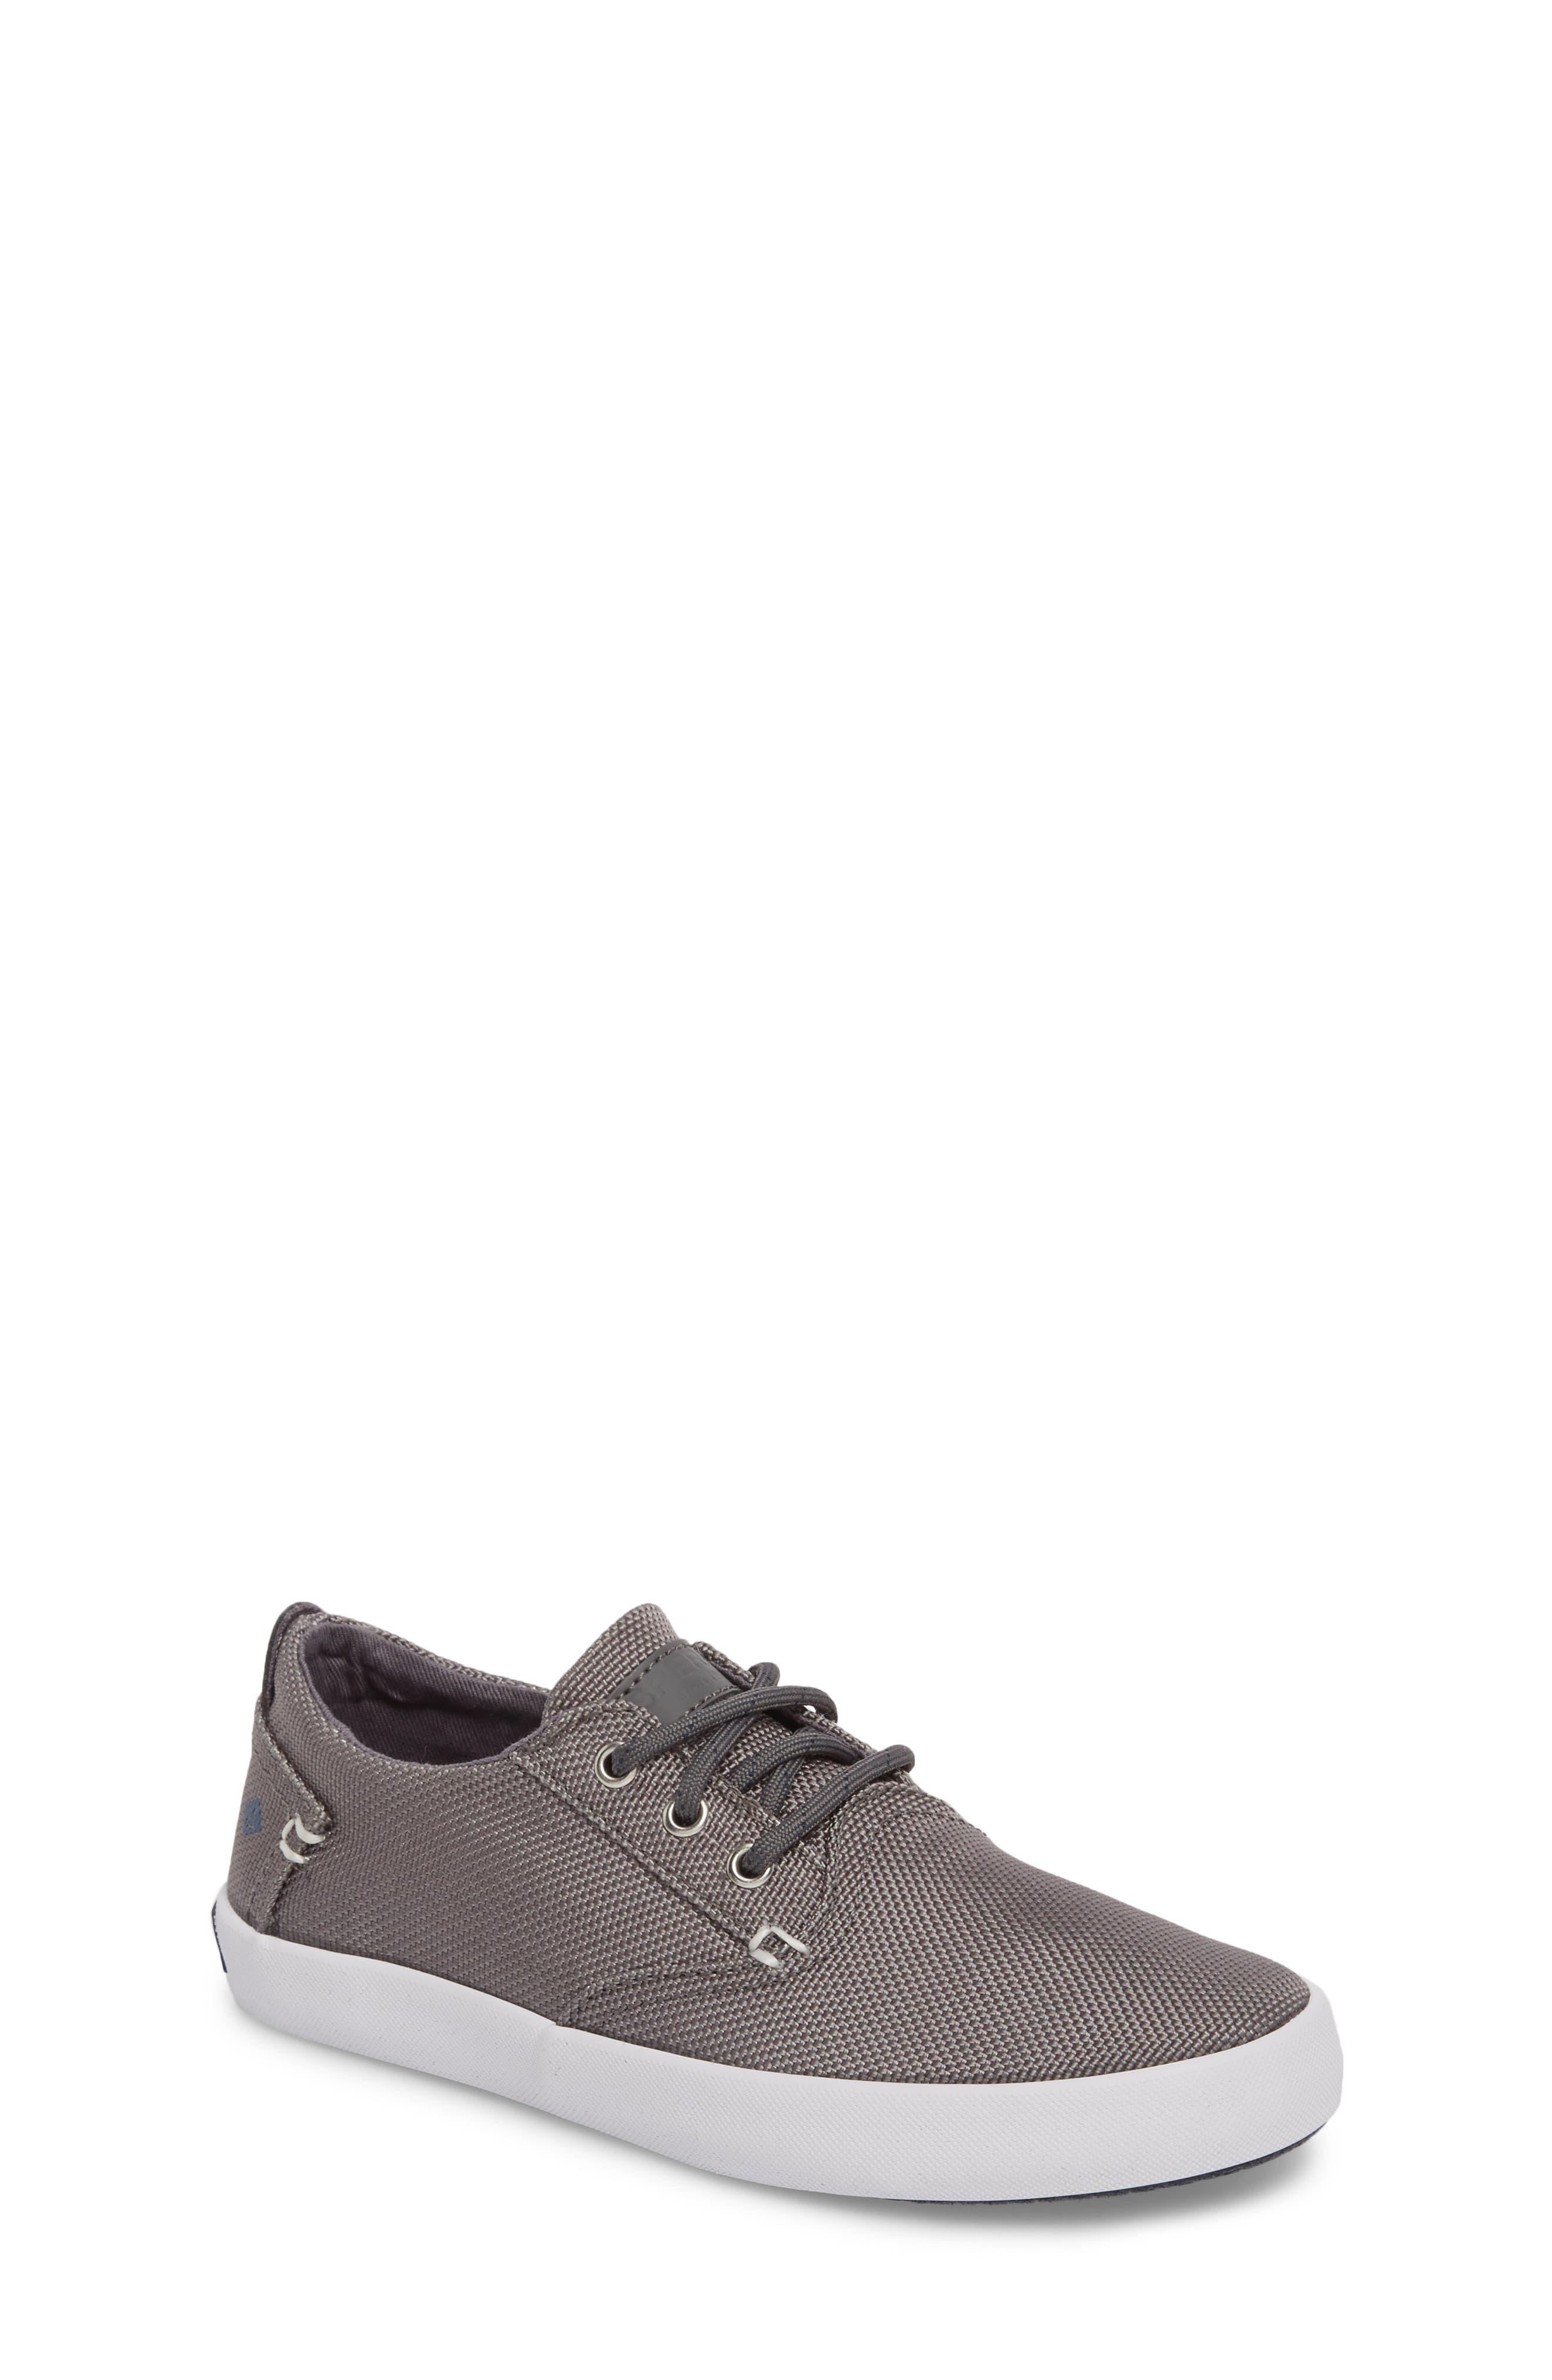 Bodie Sneaker,                         Main,                         color, GREY